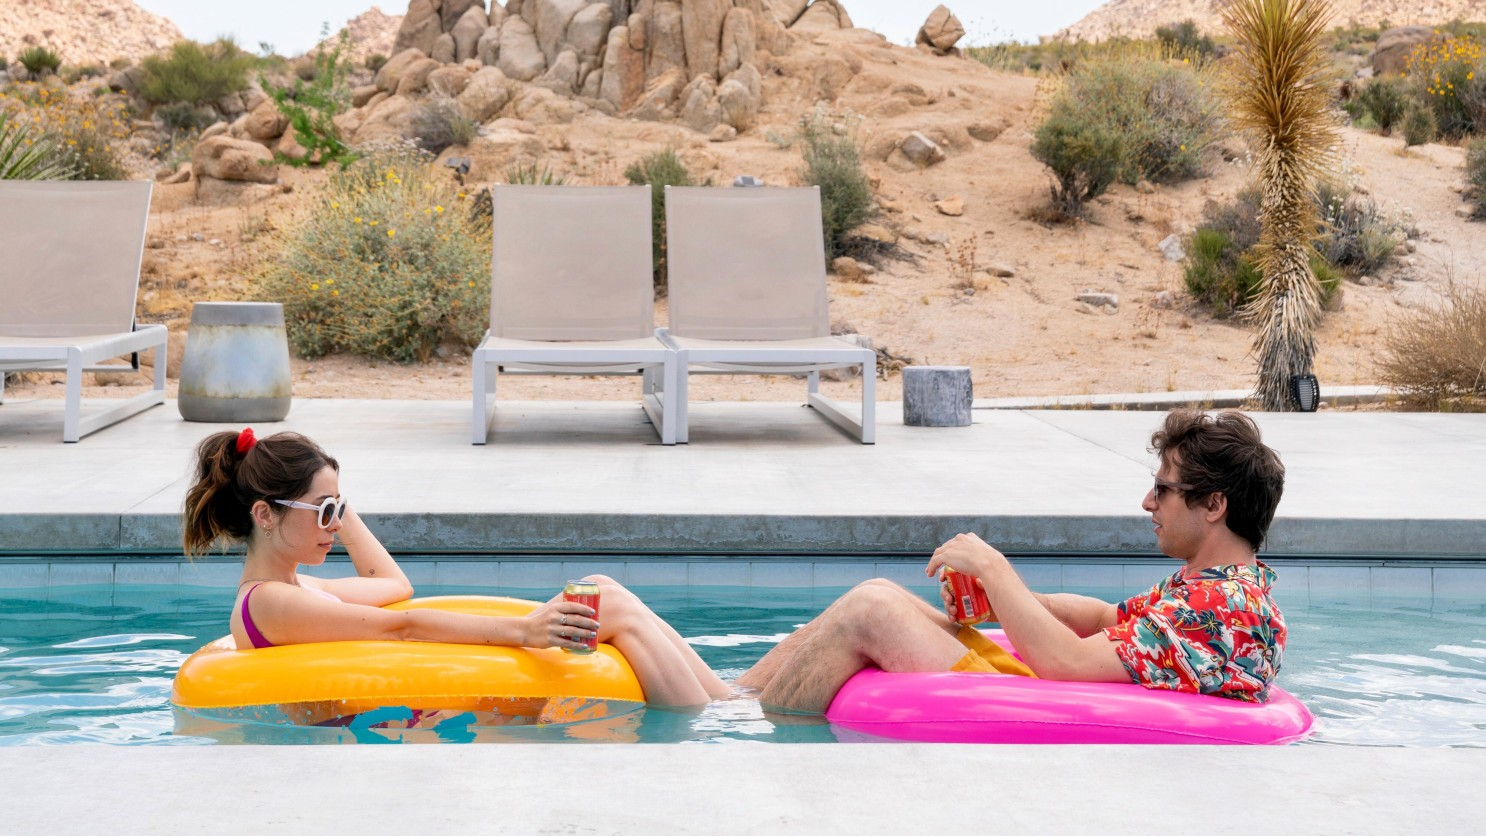 Palm Springs - Nyles és Sarah a medencében